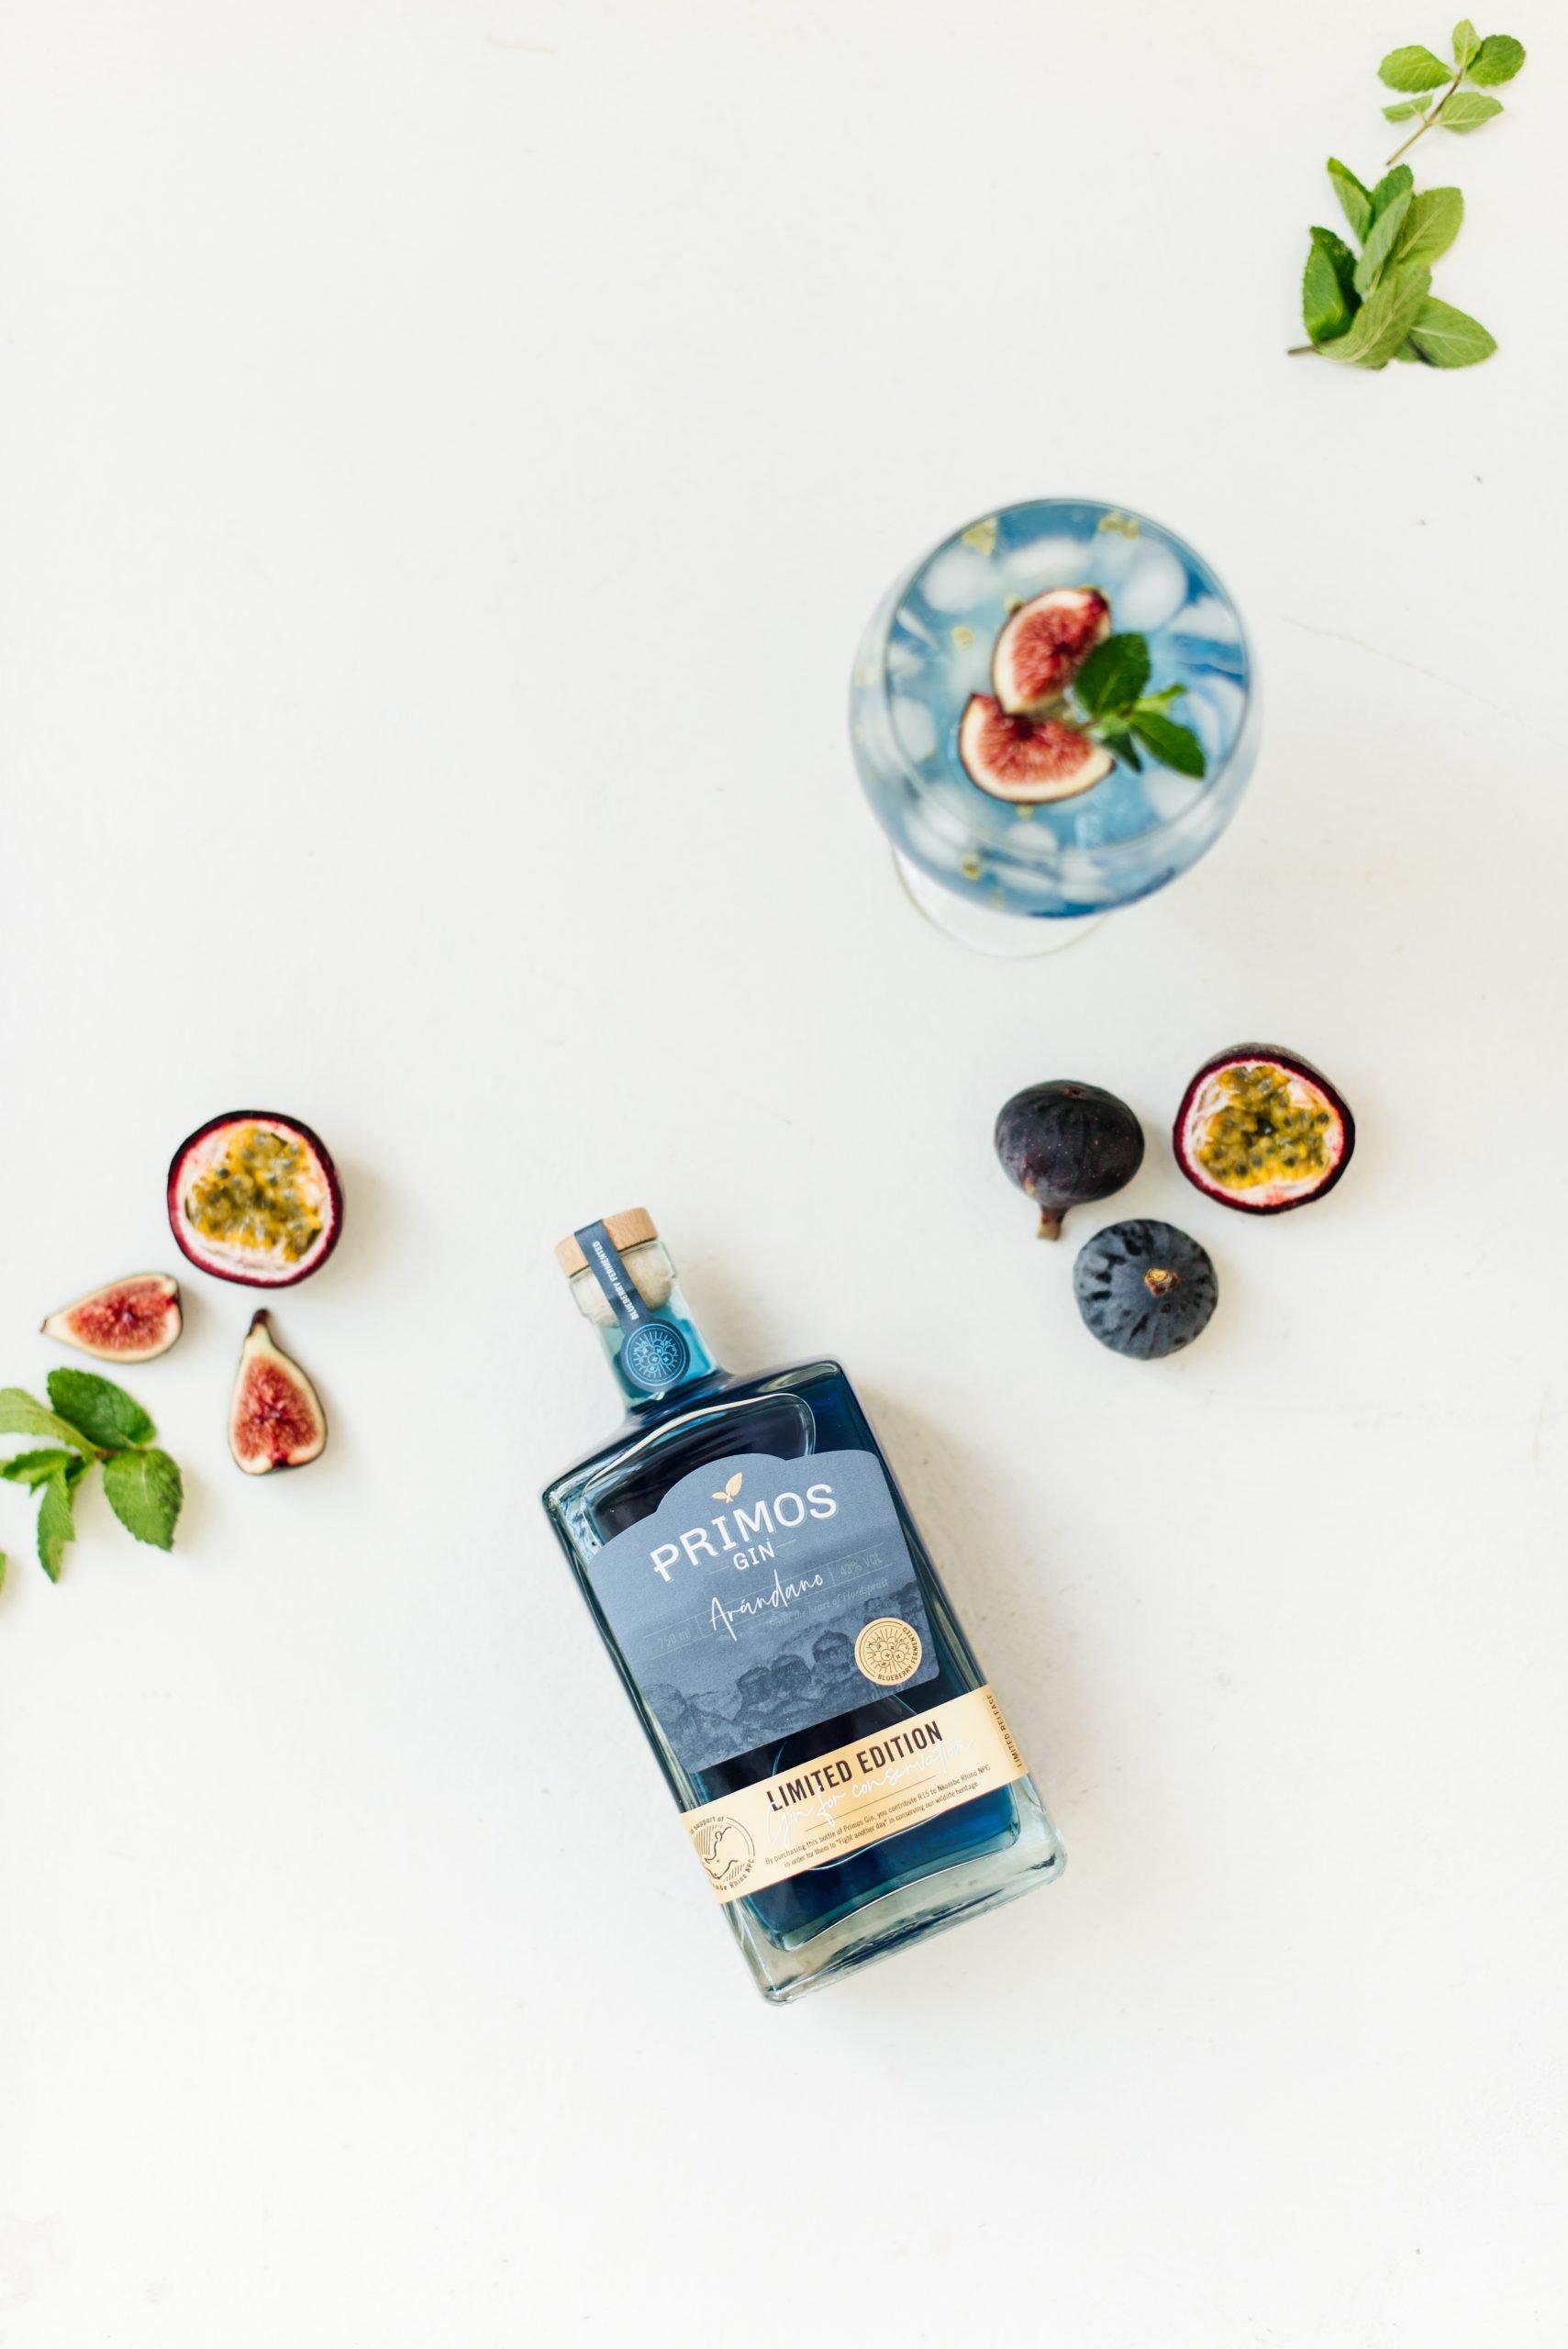 Primos Gin Arandano, Zuid-Afrika, Alles over gin.